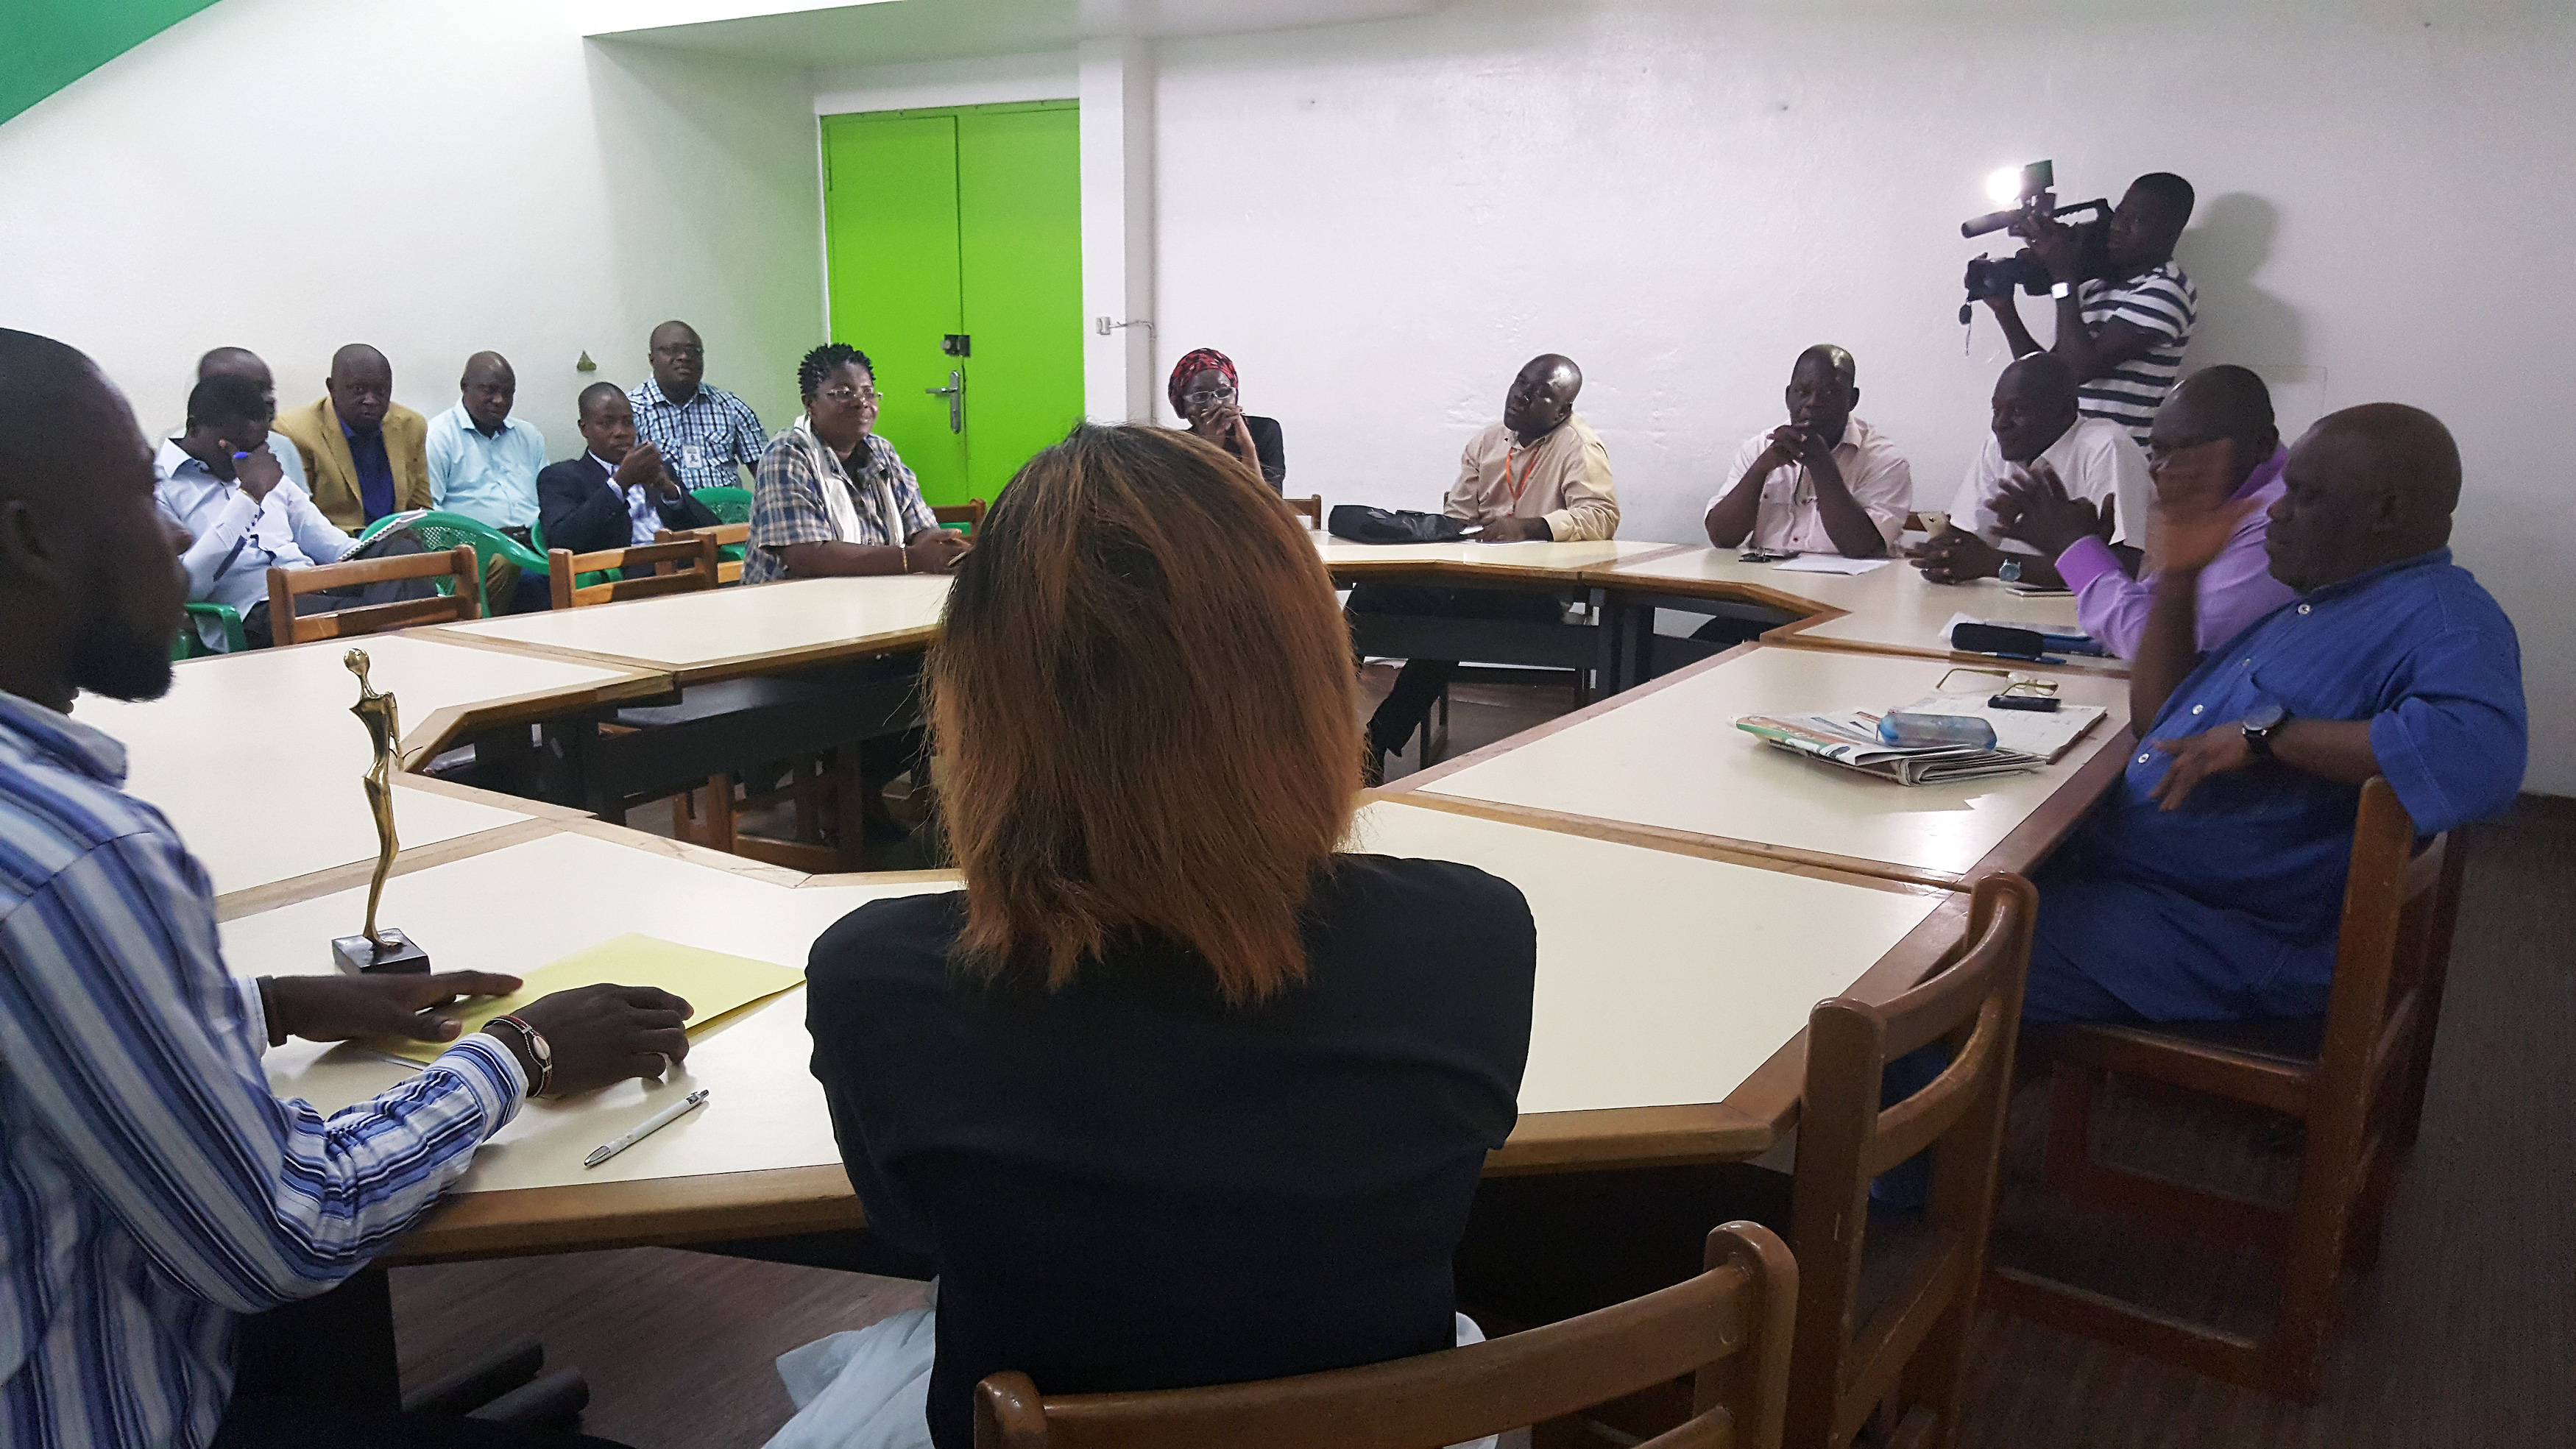 16-02-Lydia-Ludic-Côte-dIvoire-Abidjan-CSR-Social-Prix-Francis-Perez-Liberté-Expression (12)